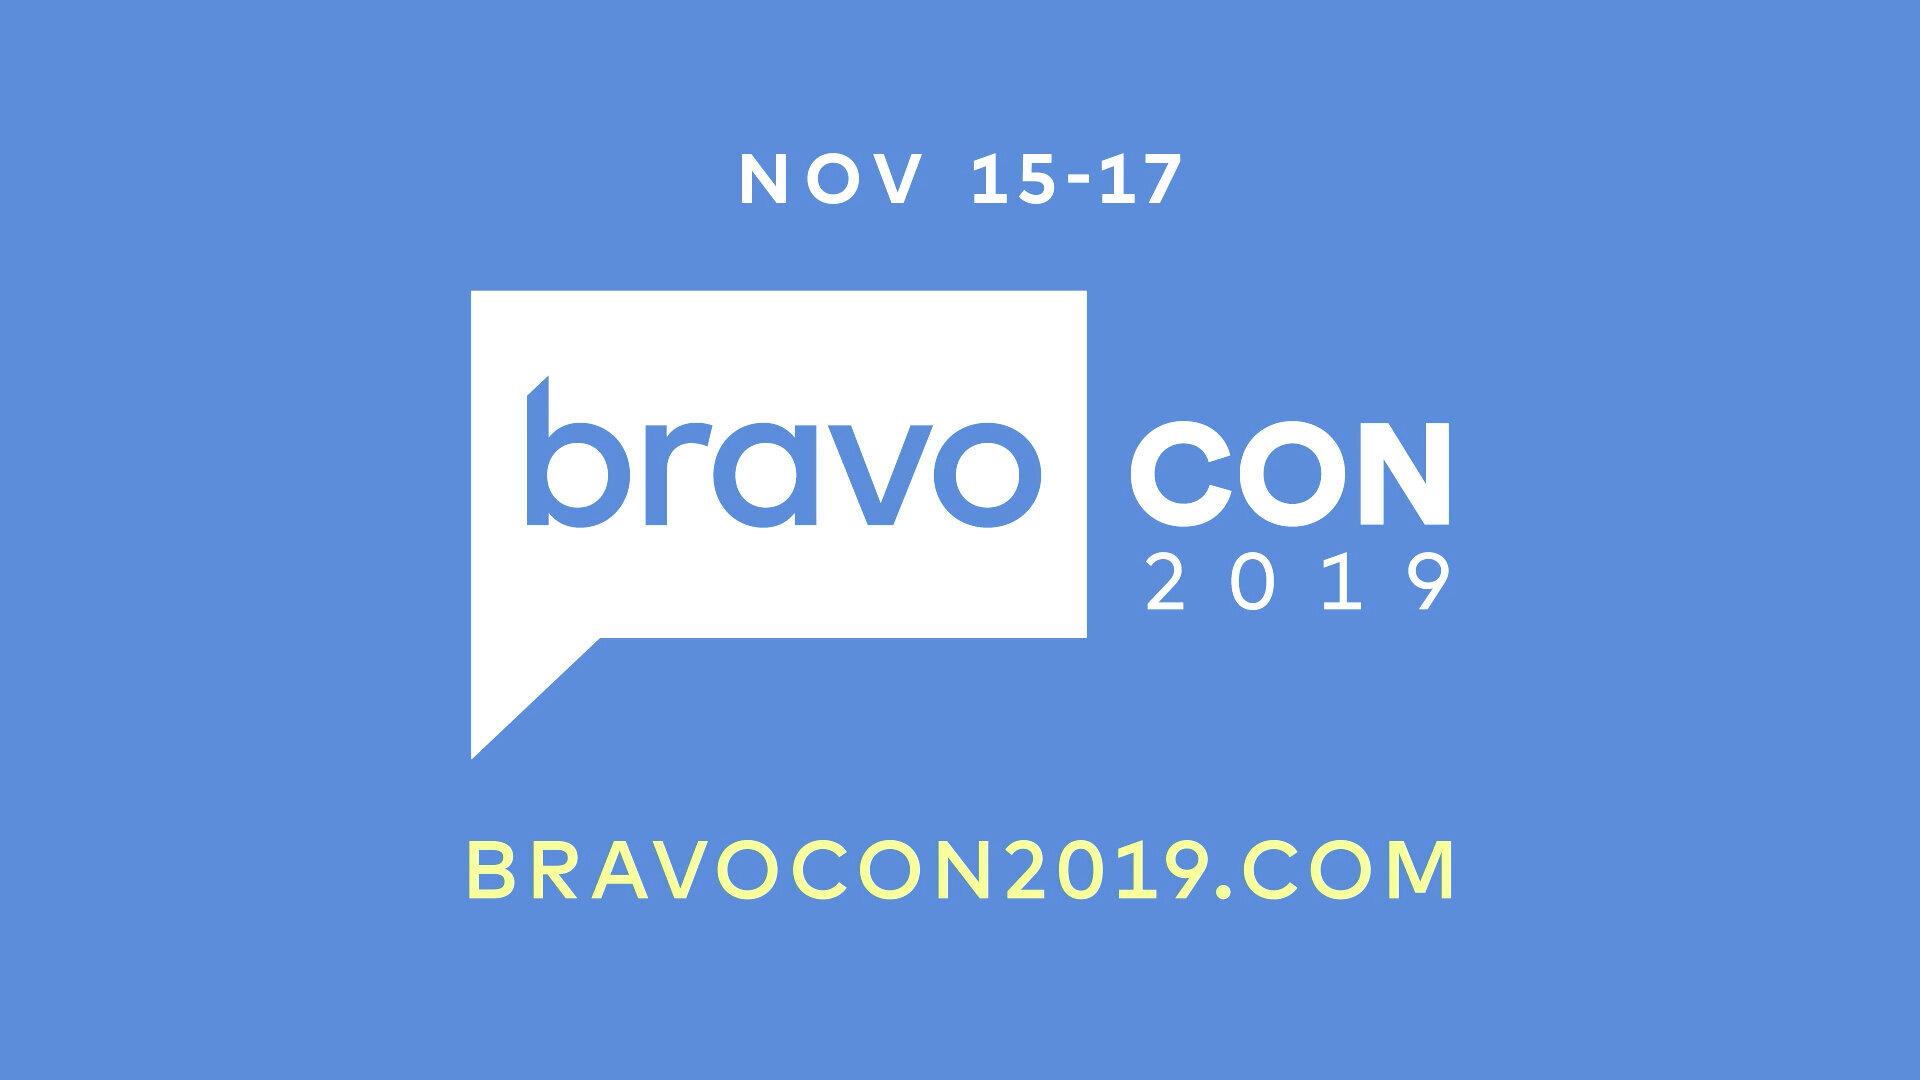 190808_4001740_BravoCon_is_Coming_This_November_.jpg